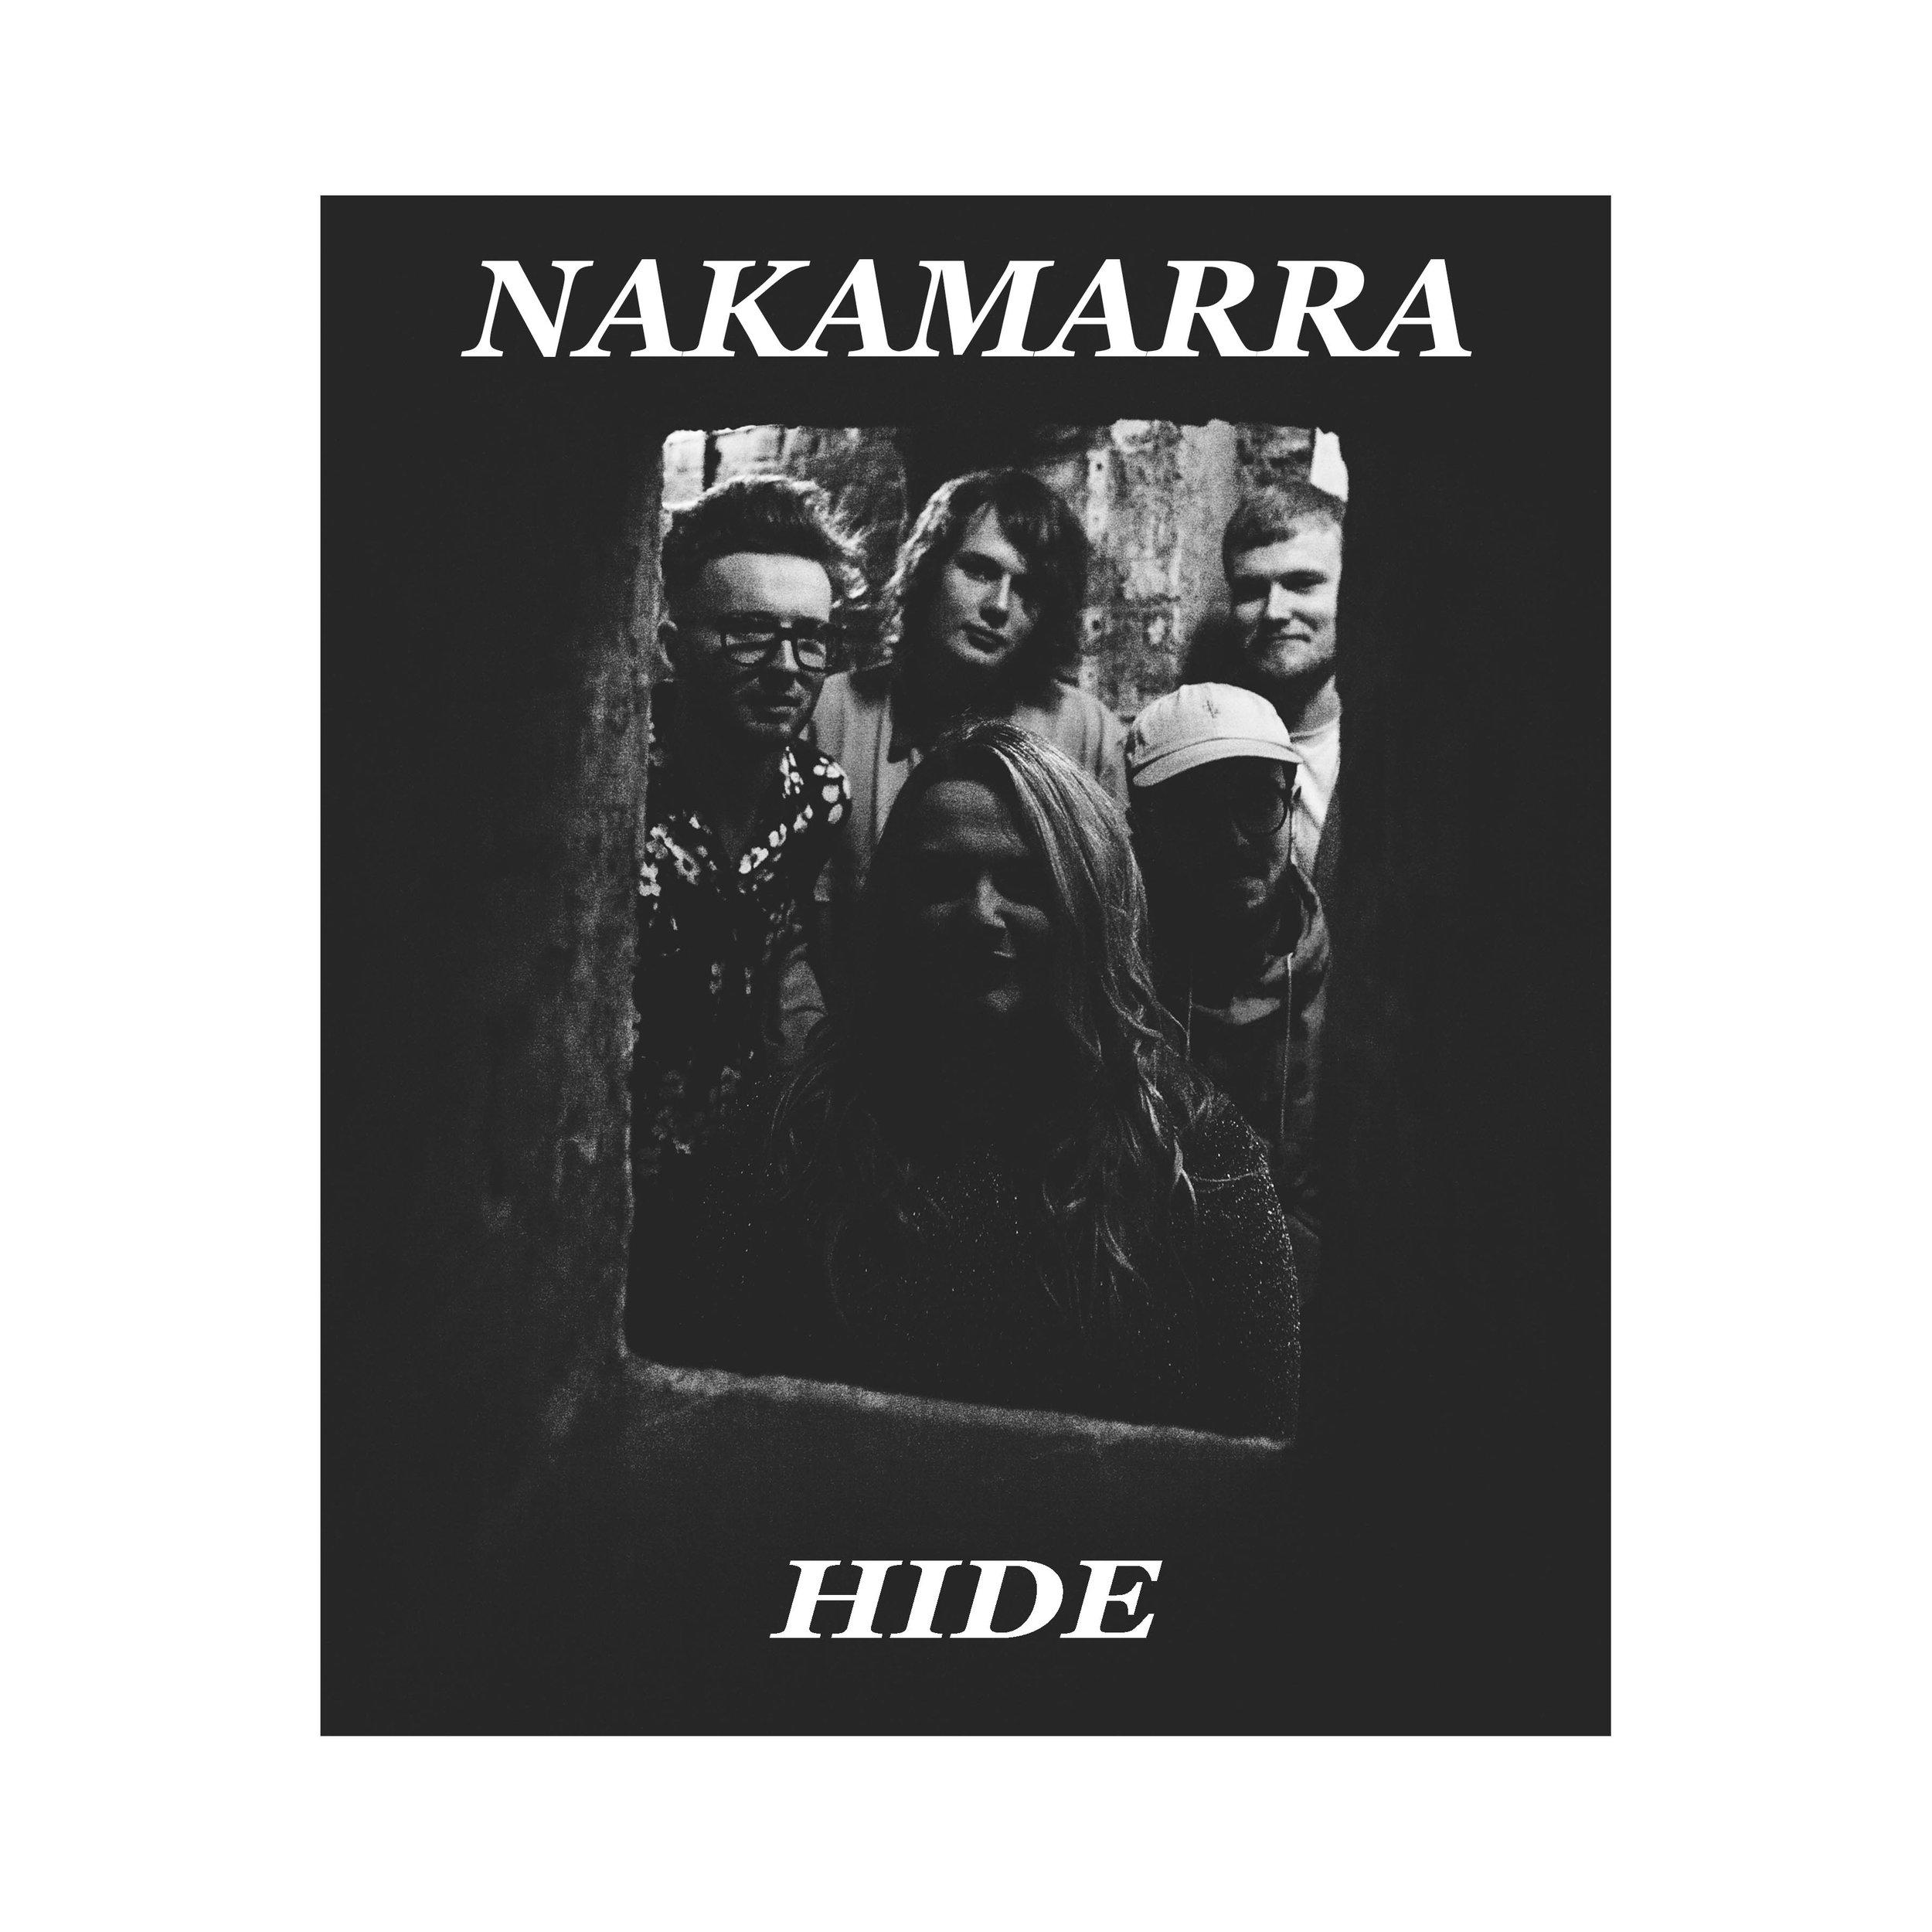 NAKAMARRA - HIDE ARTWORK FINAL (low rez).jpg